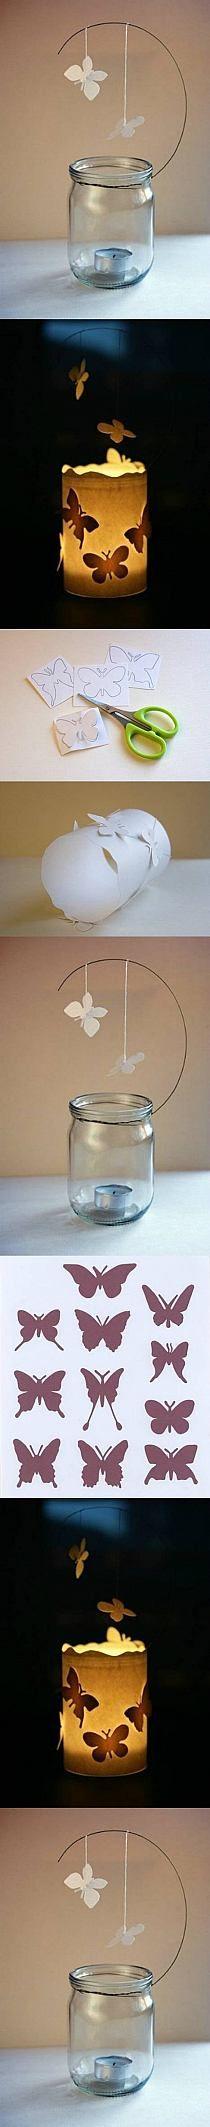 DIY Paper Butterfly Mobile DIY Projects | UsefulDIY.com